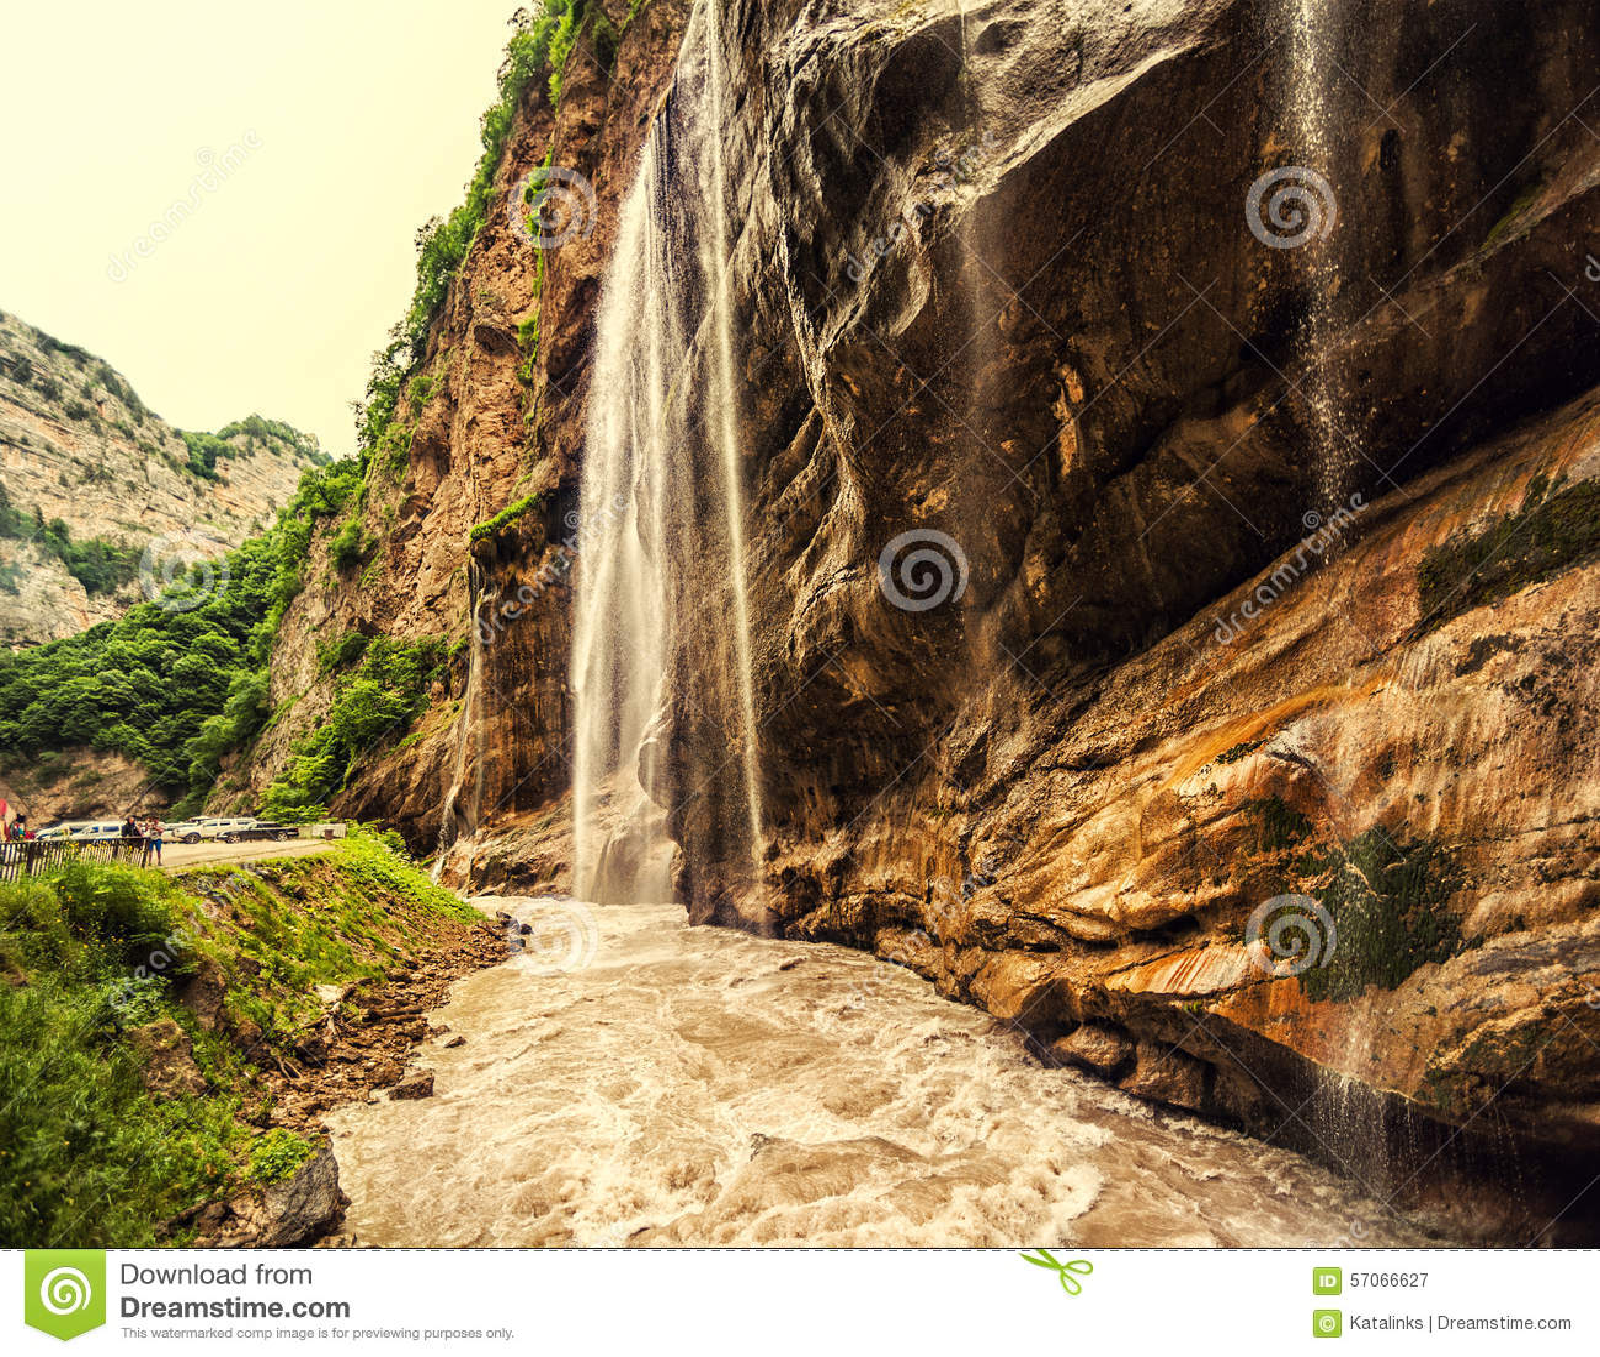 Chegemwatervallen in ruwe canion en berg